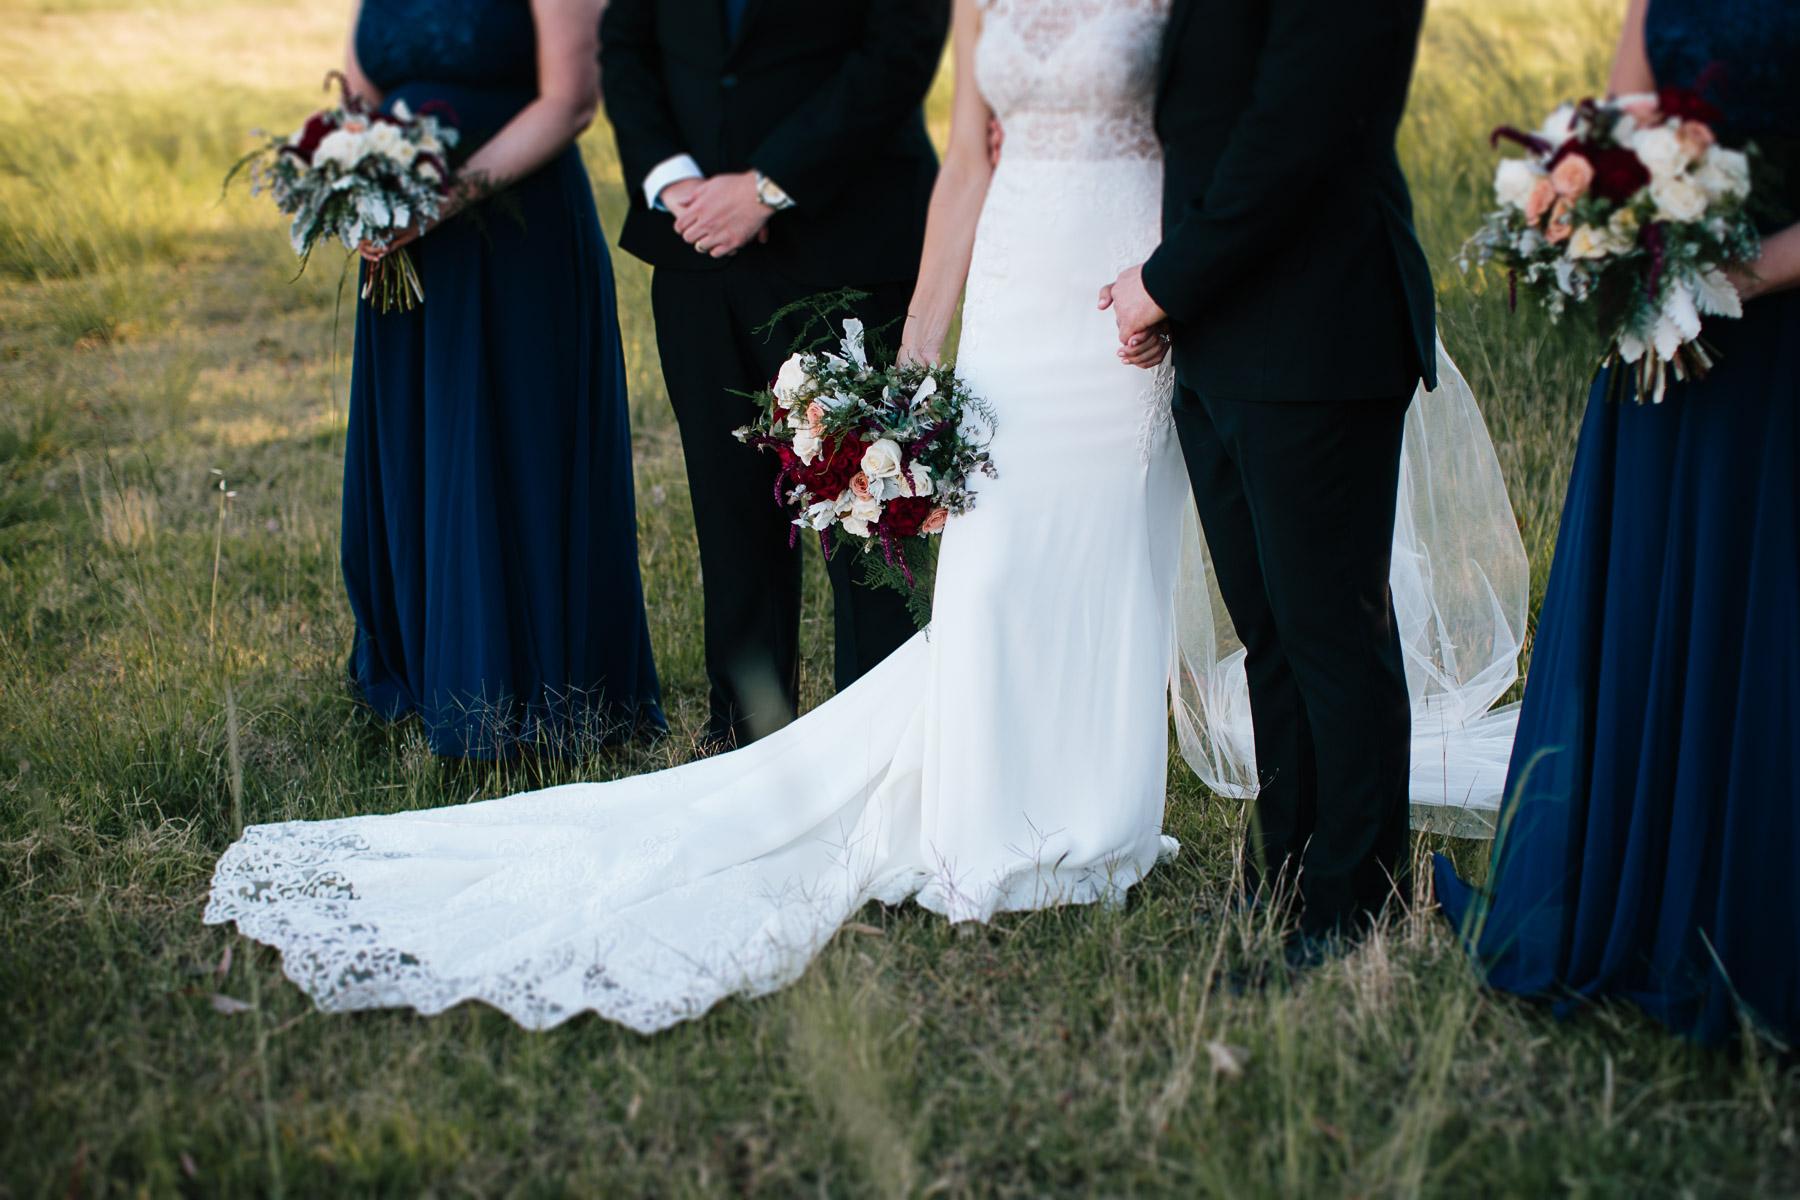 paige-john-chapel-farm-wedding-47.JPG